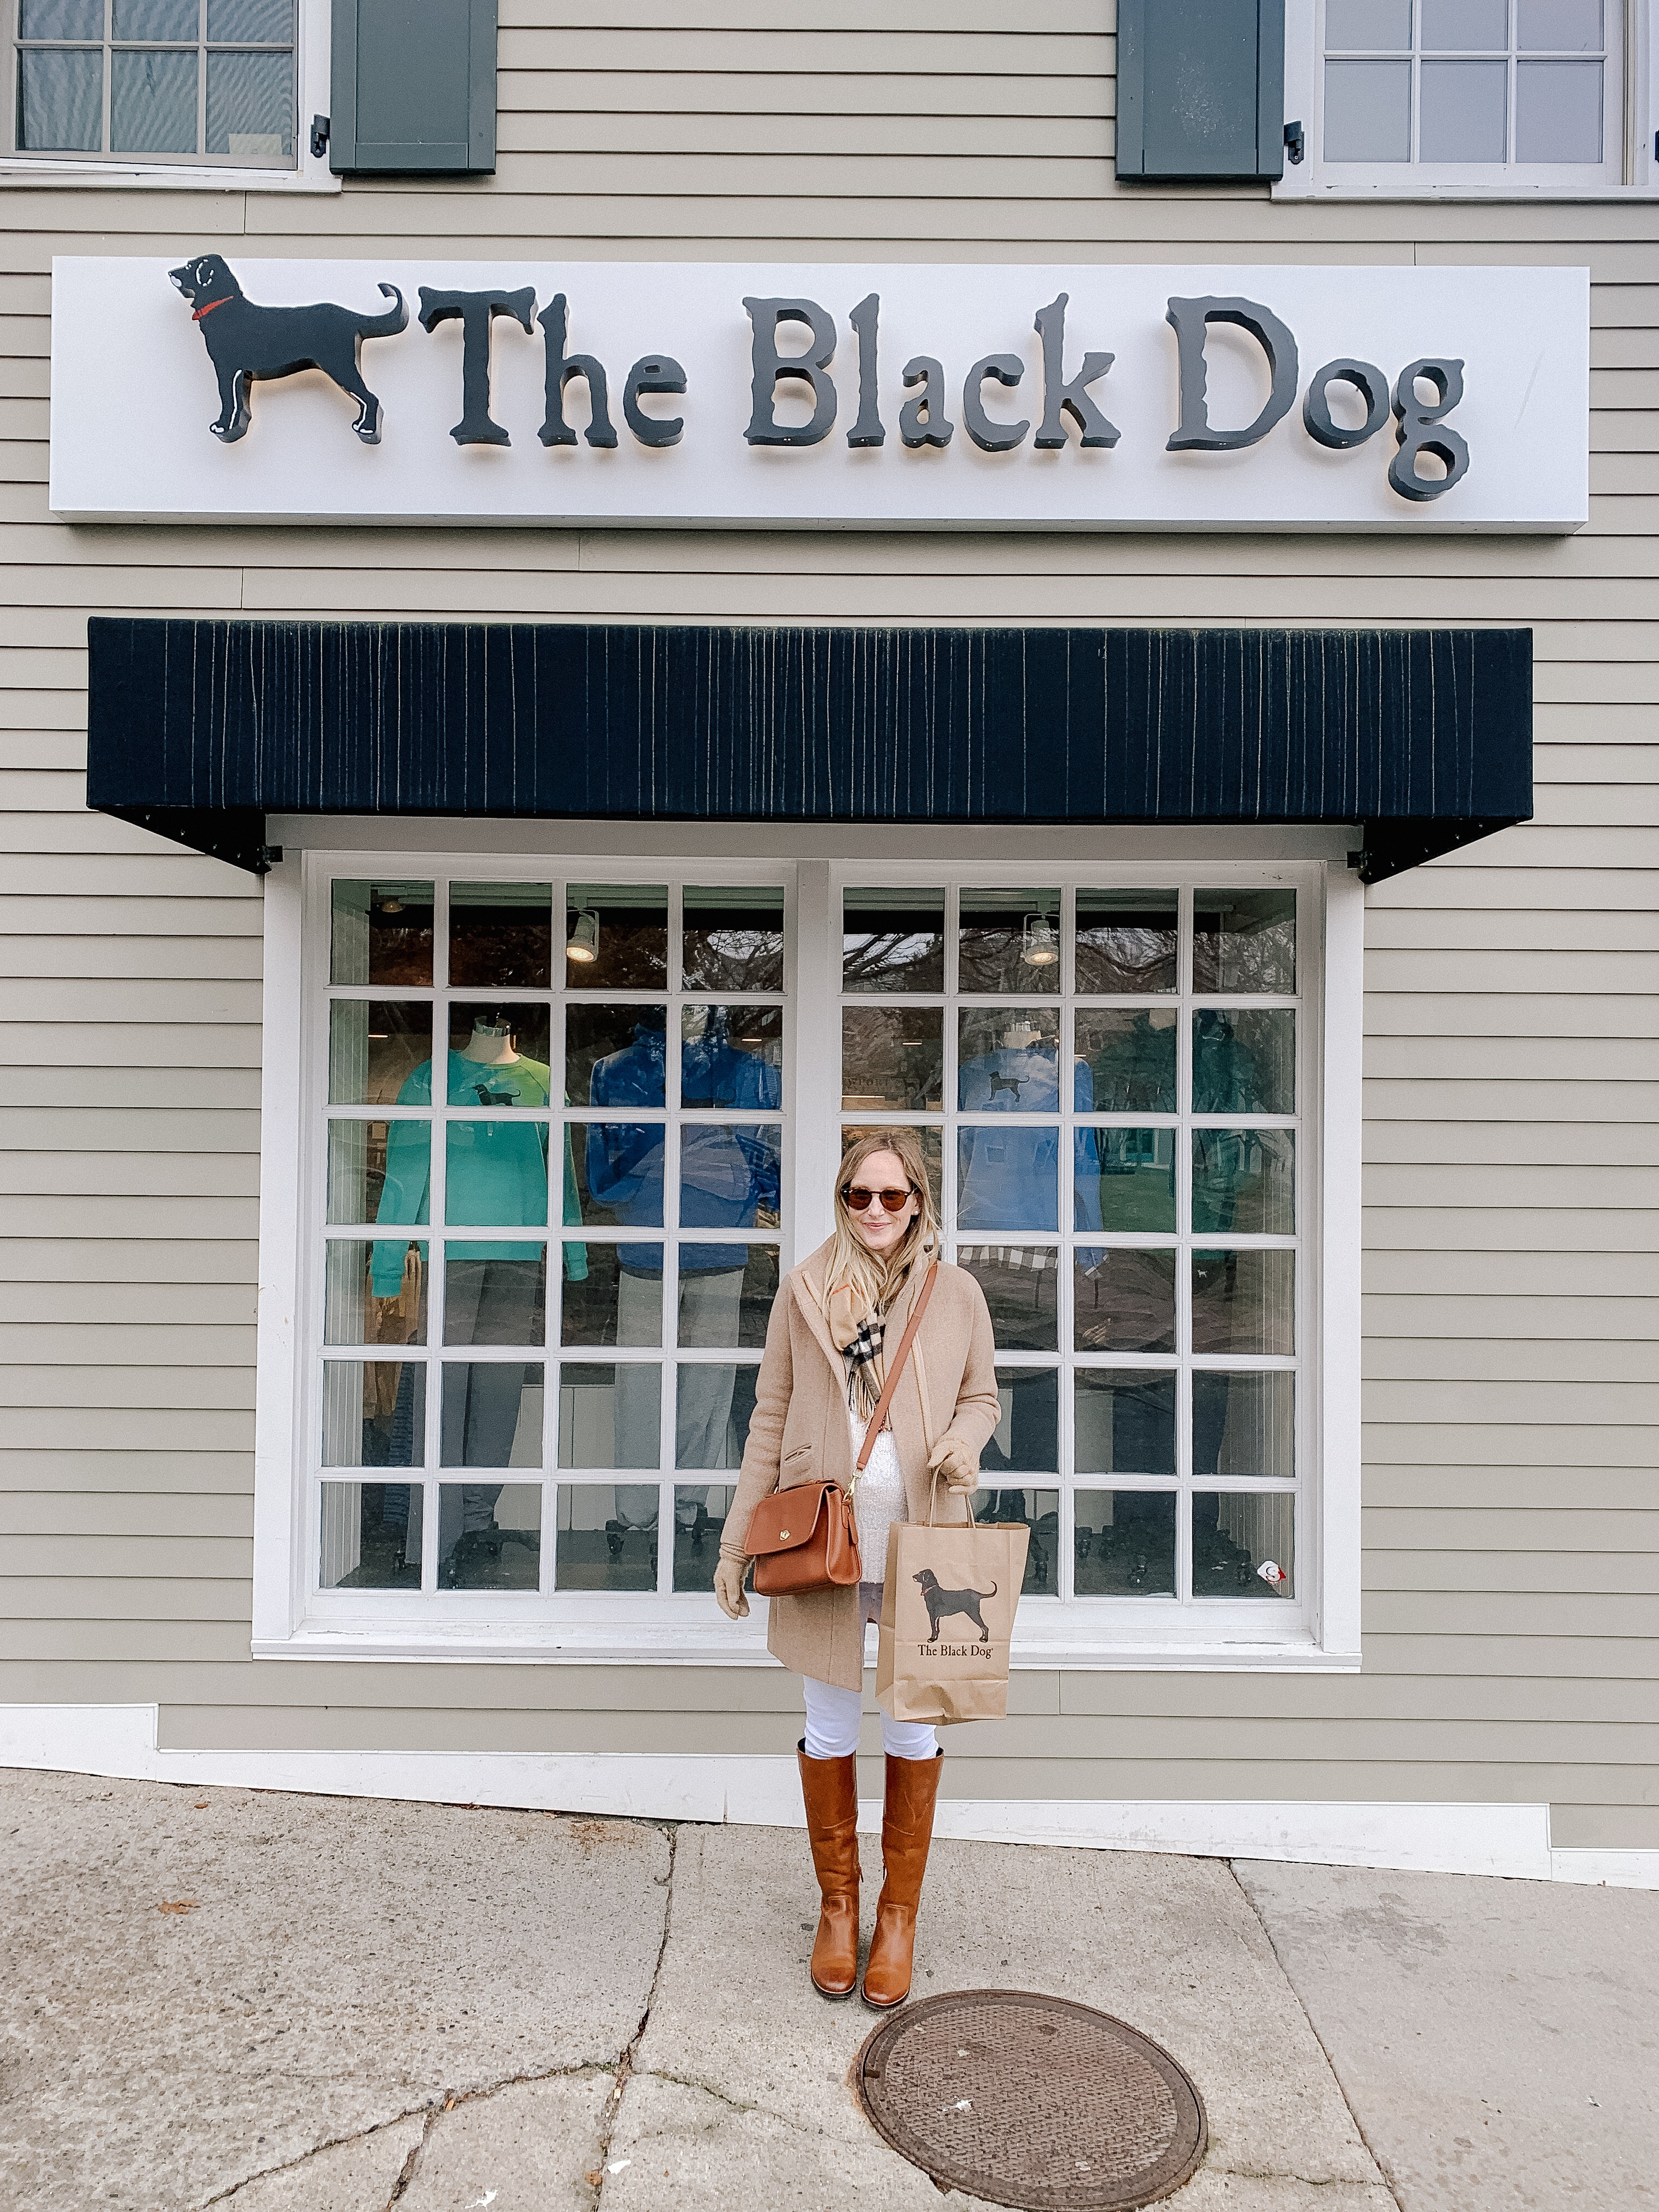 The Black Dog Store